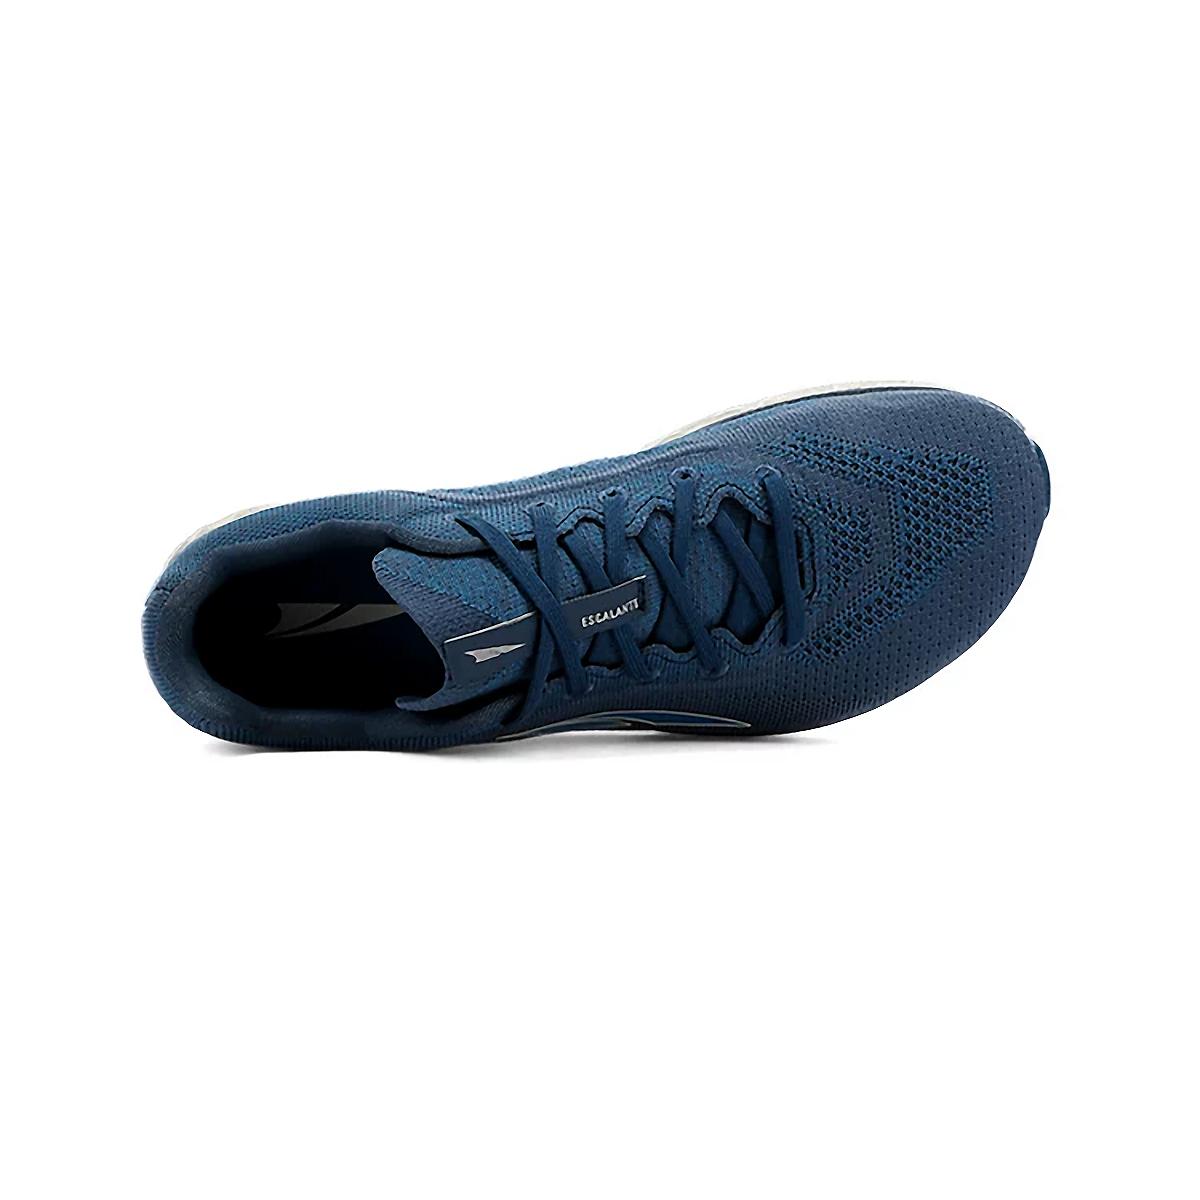 Men's Altra Escalante 2.5 Running Shoe - Color: Majolica Blue - Size: 7 - Width: Regular, Majolica Blue, large, image 3